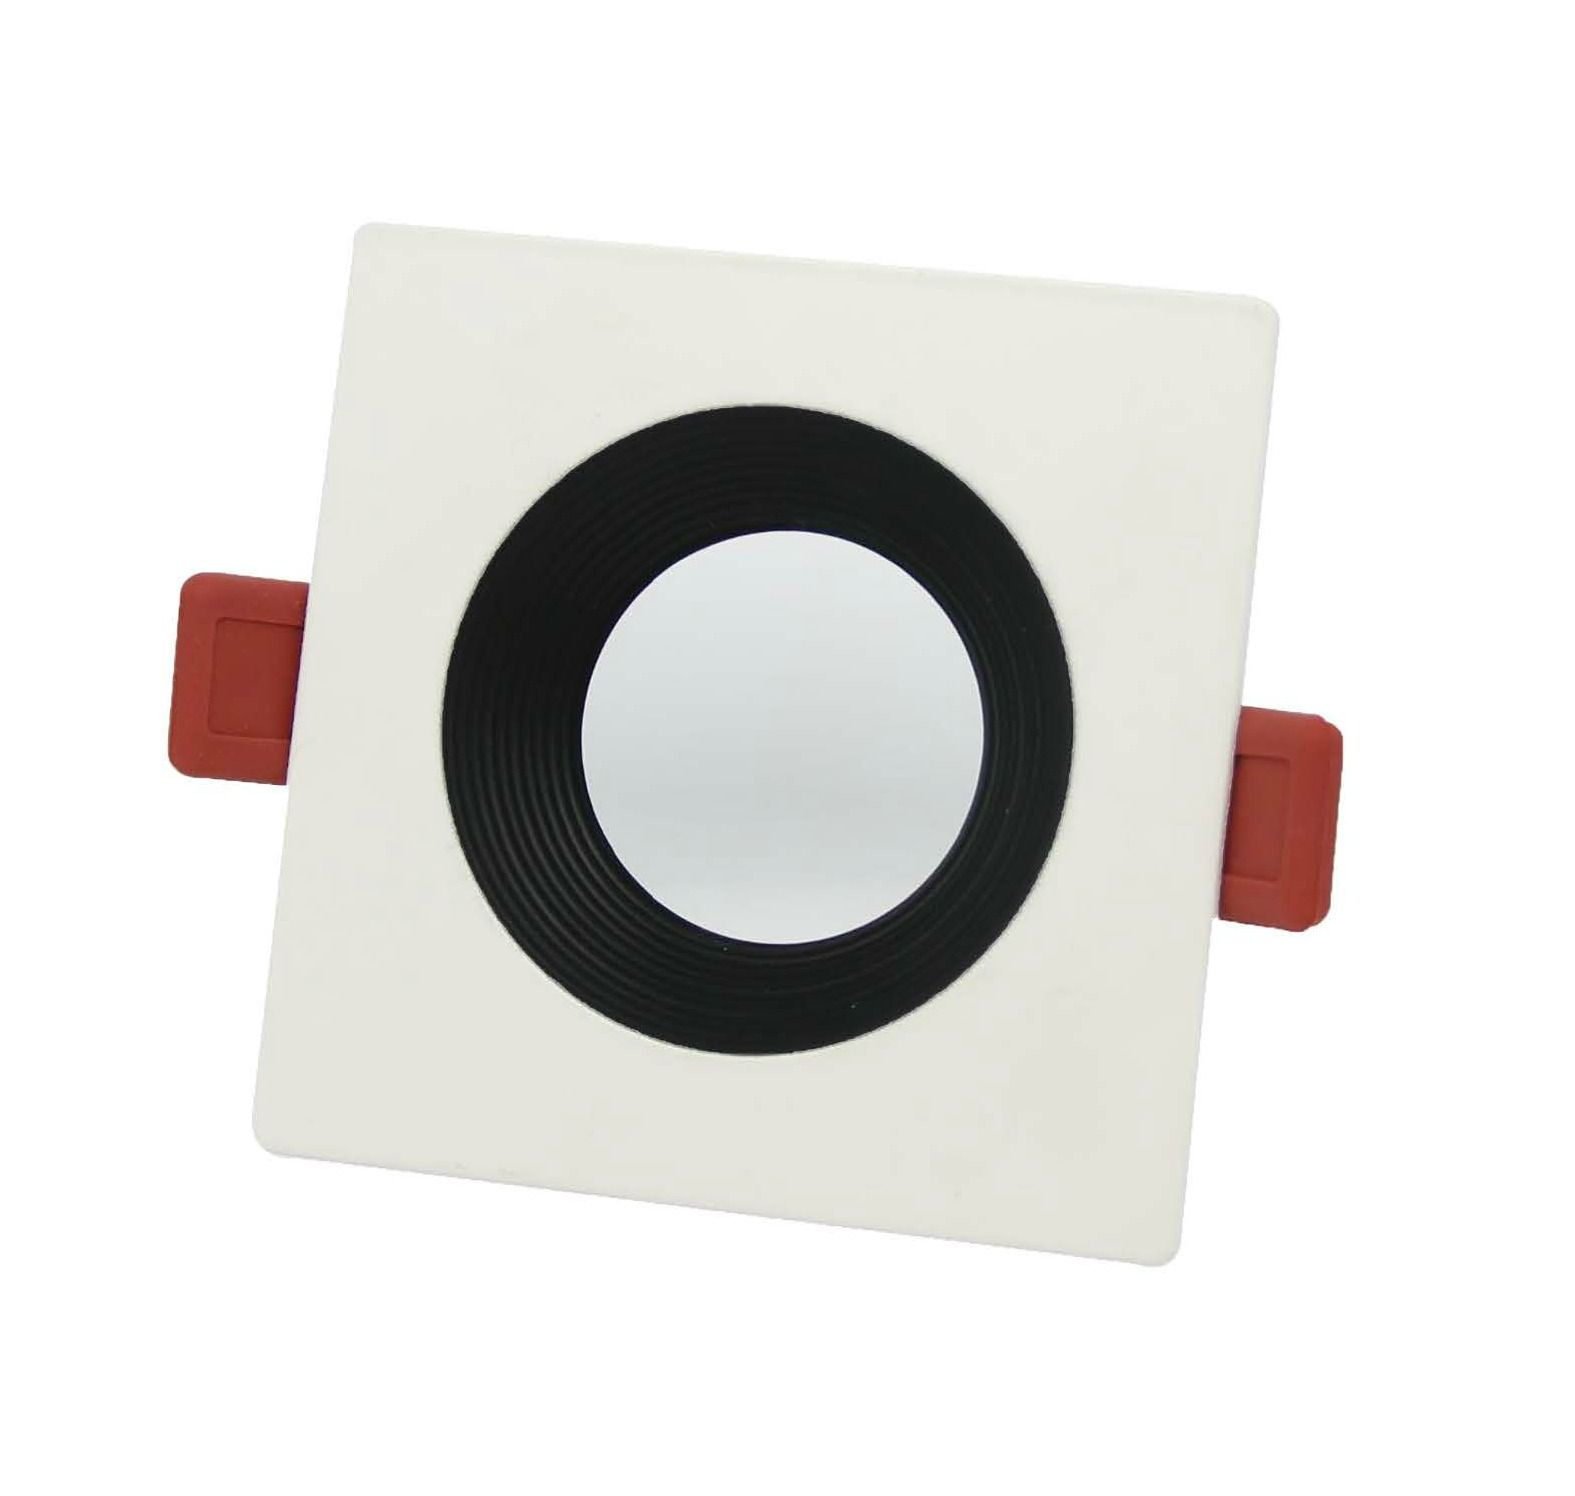 Square Weatherproof Downlight Frame